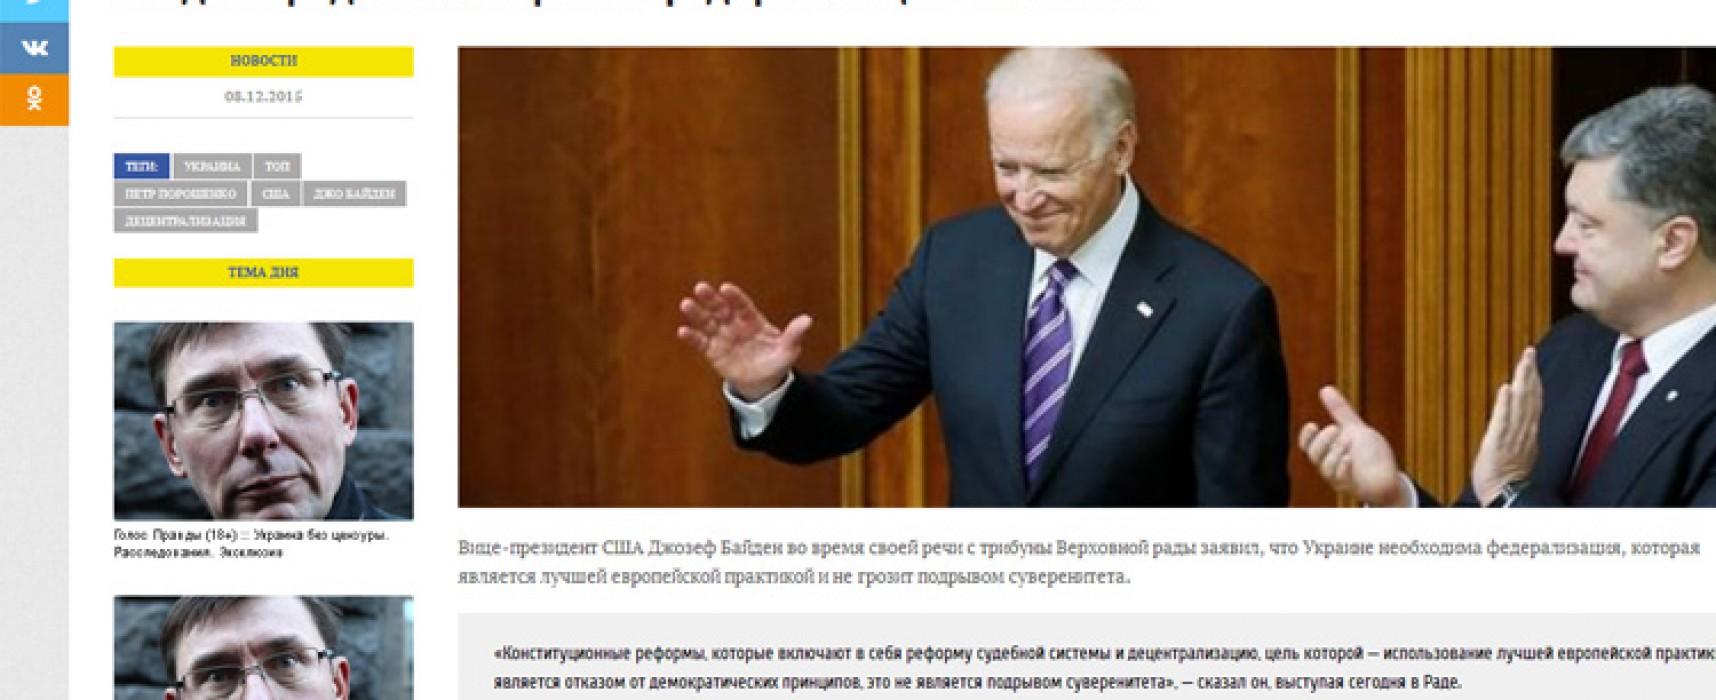 Falso: Biden ofreció a Ucrania federalizarse